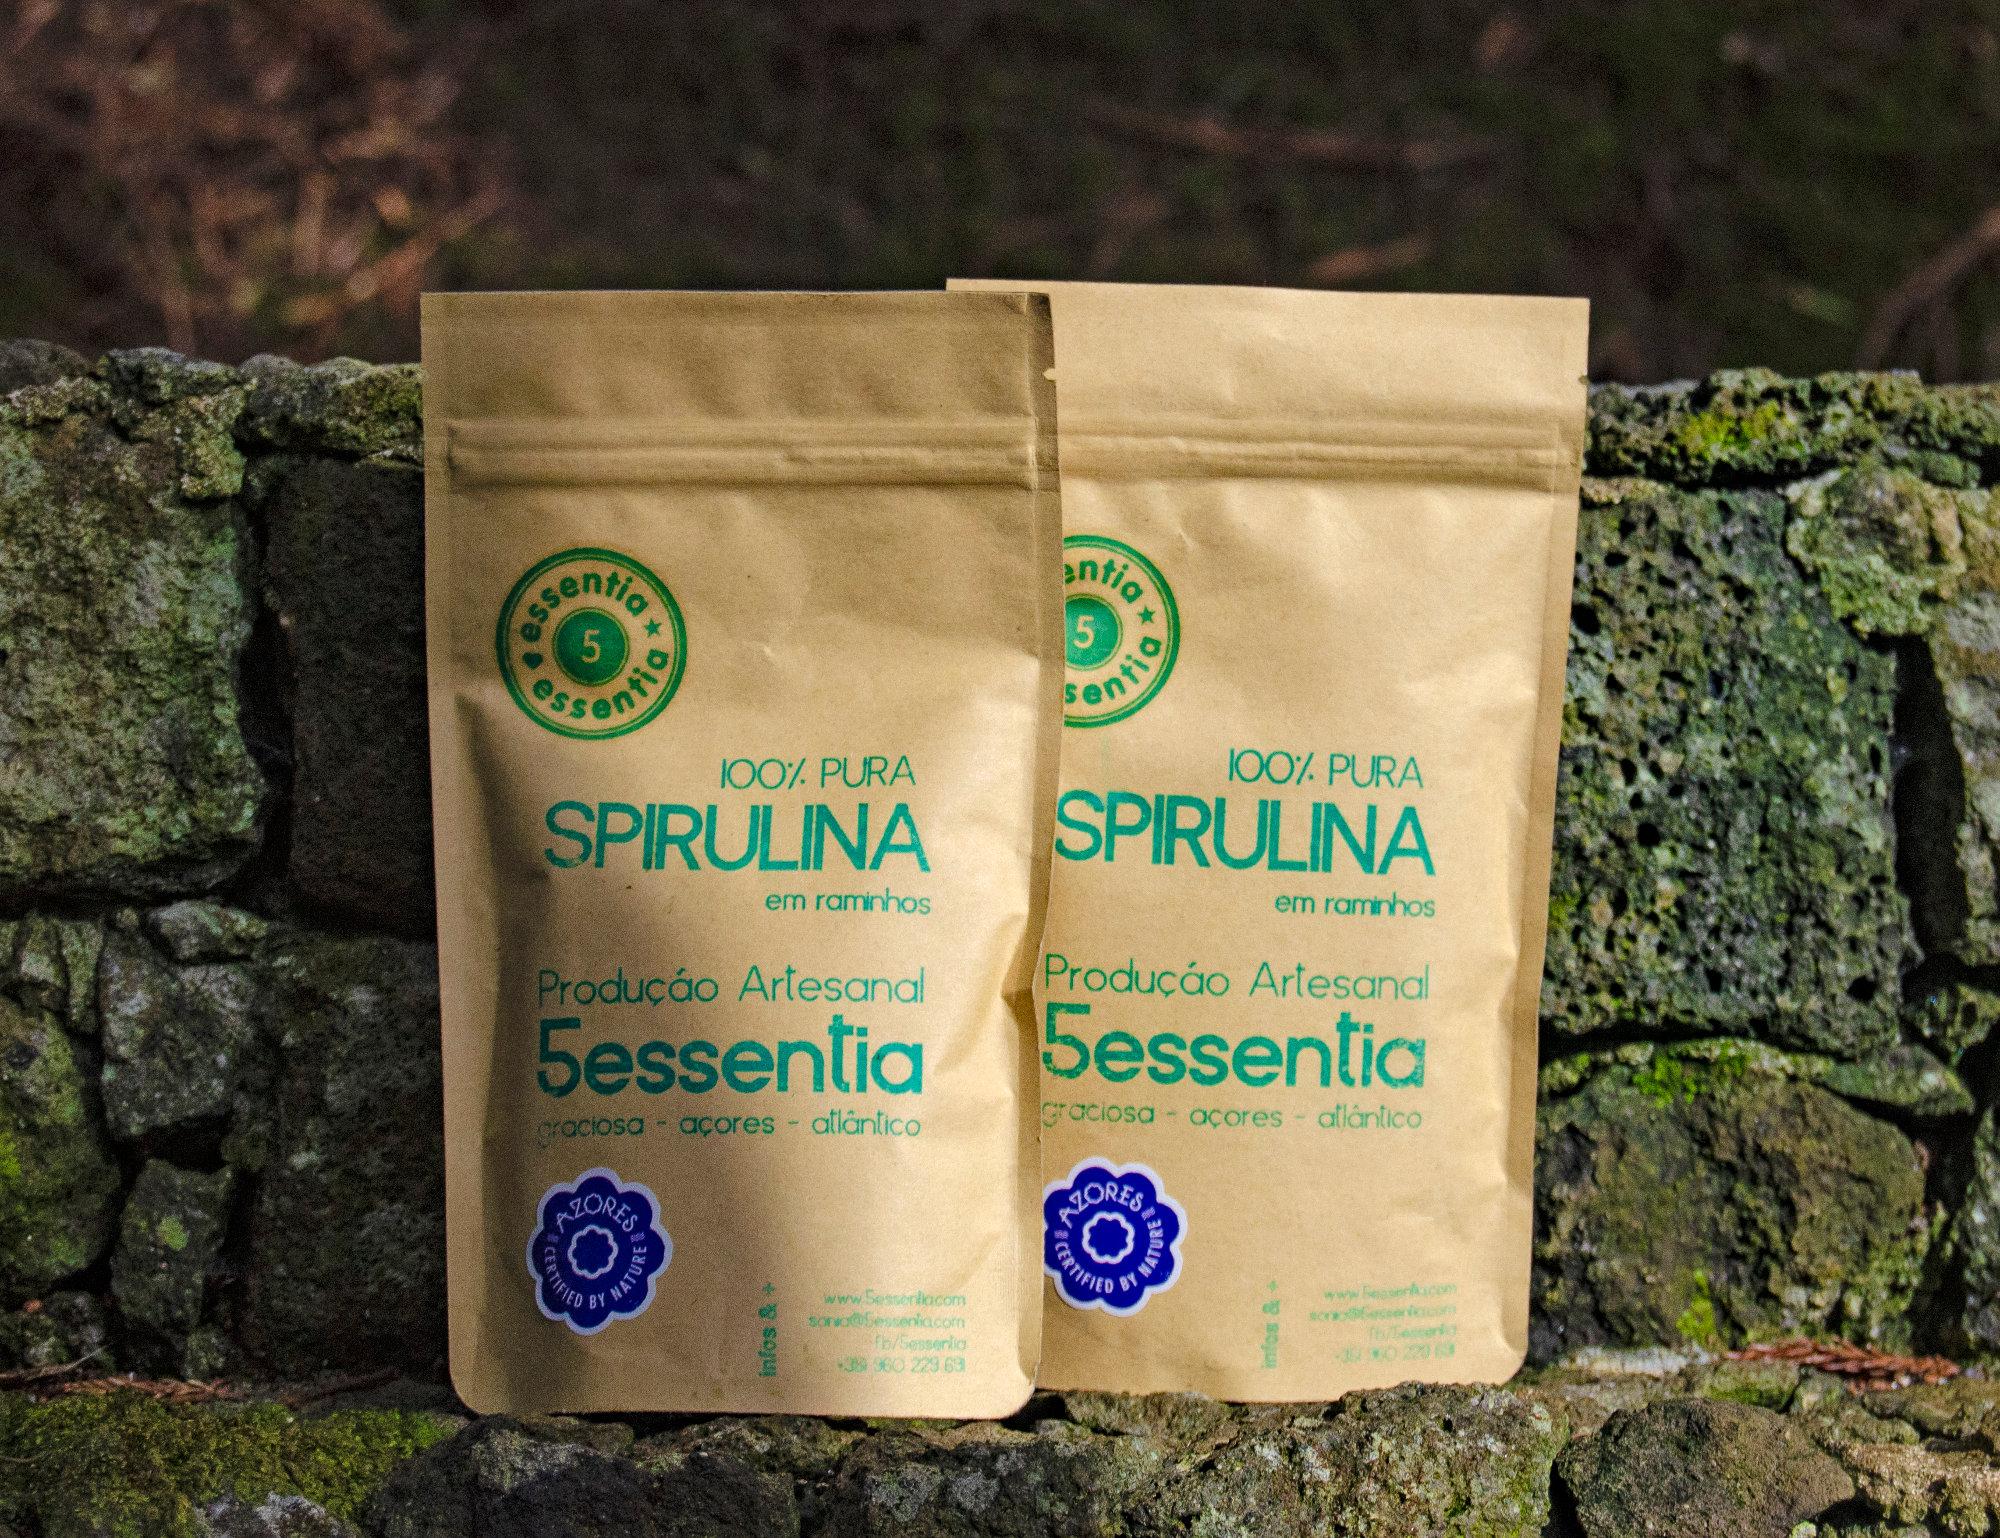 Spirulina how to take